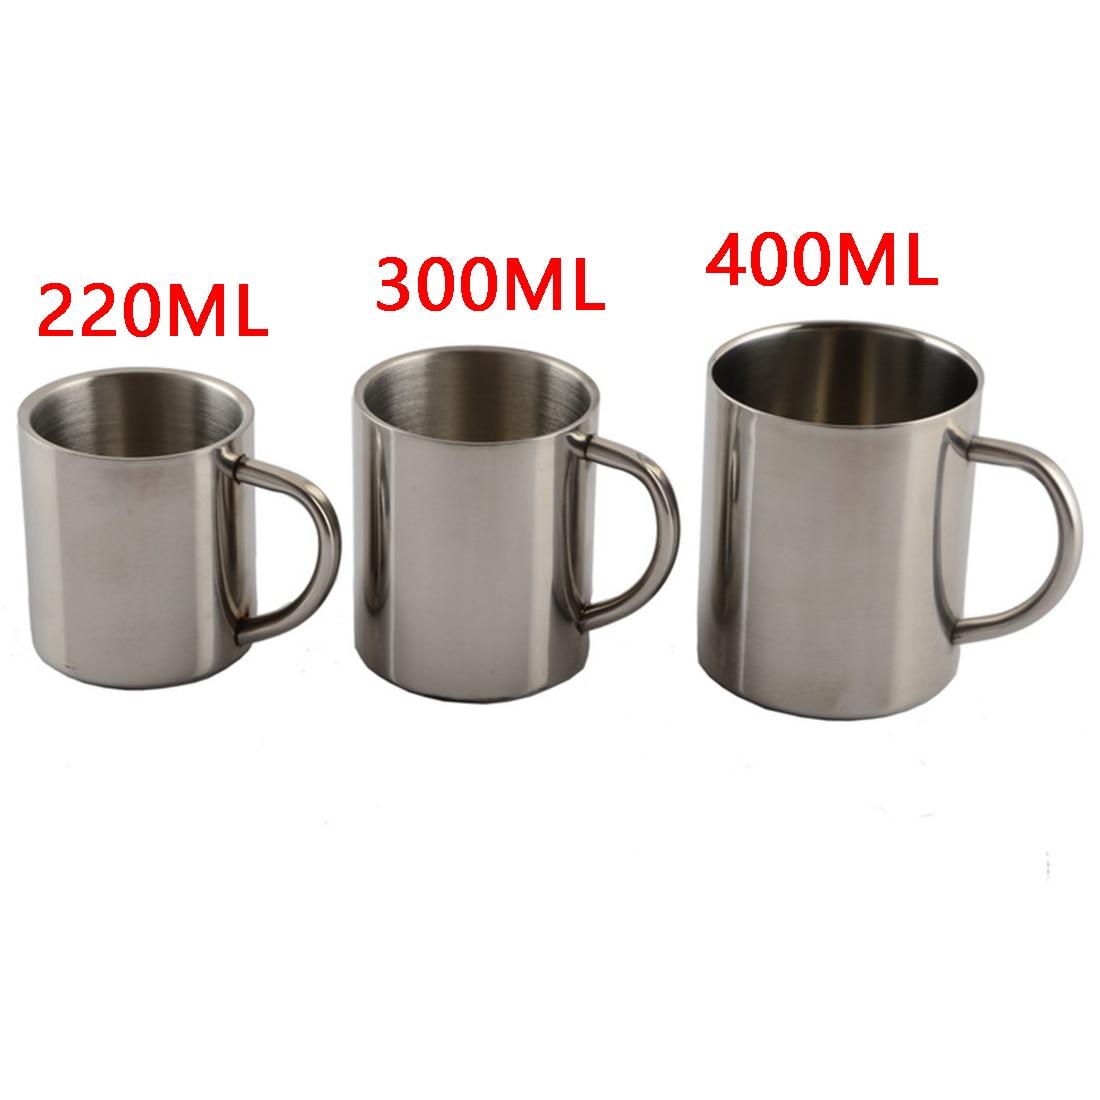 New Fashion 1pcs New 220ml 300ml 400ml Stainless Steel Portable Mug Cup Double Wall Travel Tumbler Coffee Mug Tea Cup cup